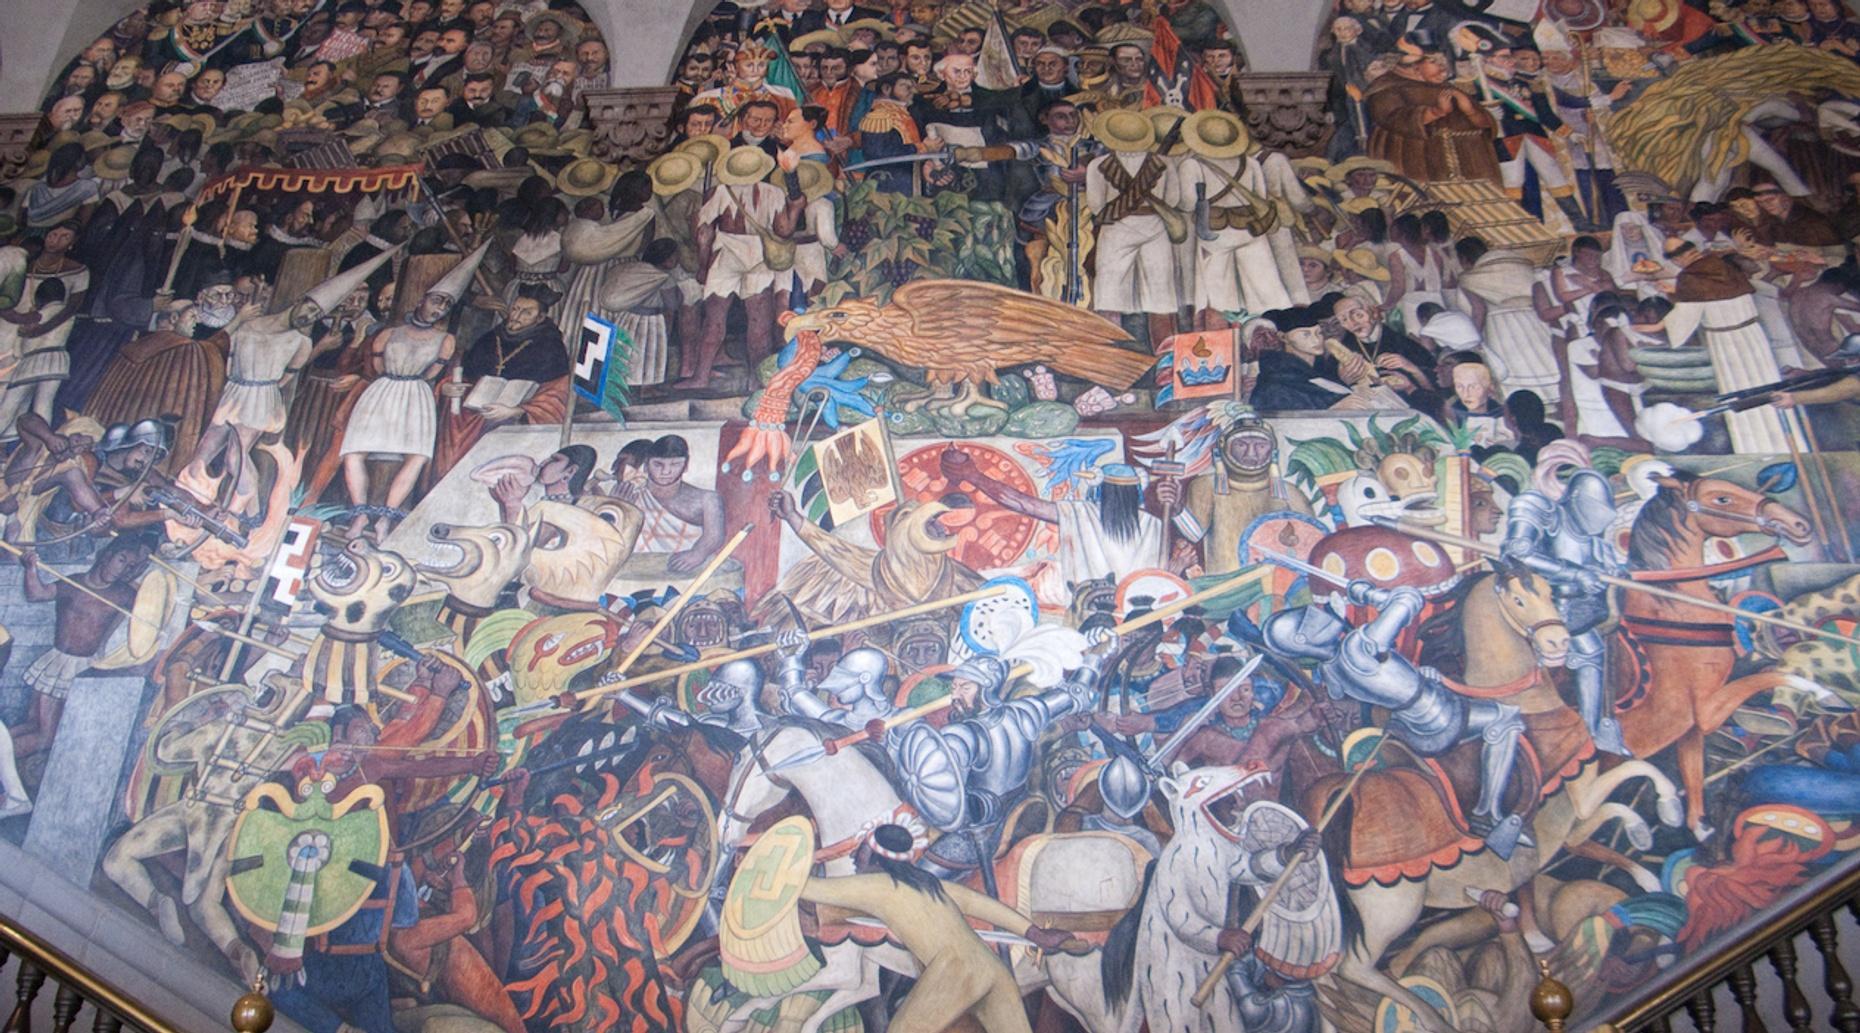 Muralist Art Walking Tour in Mexico City